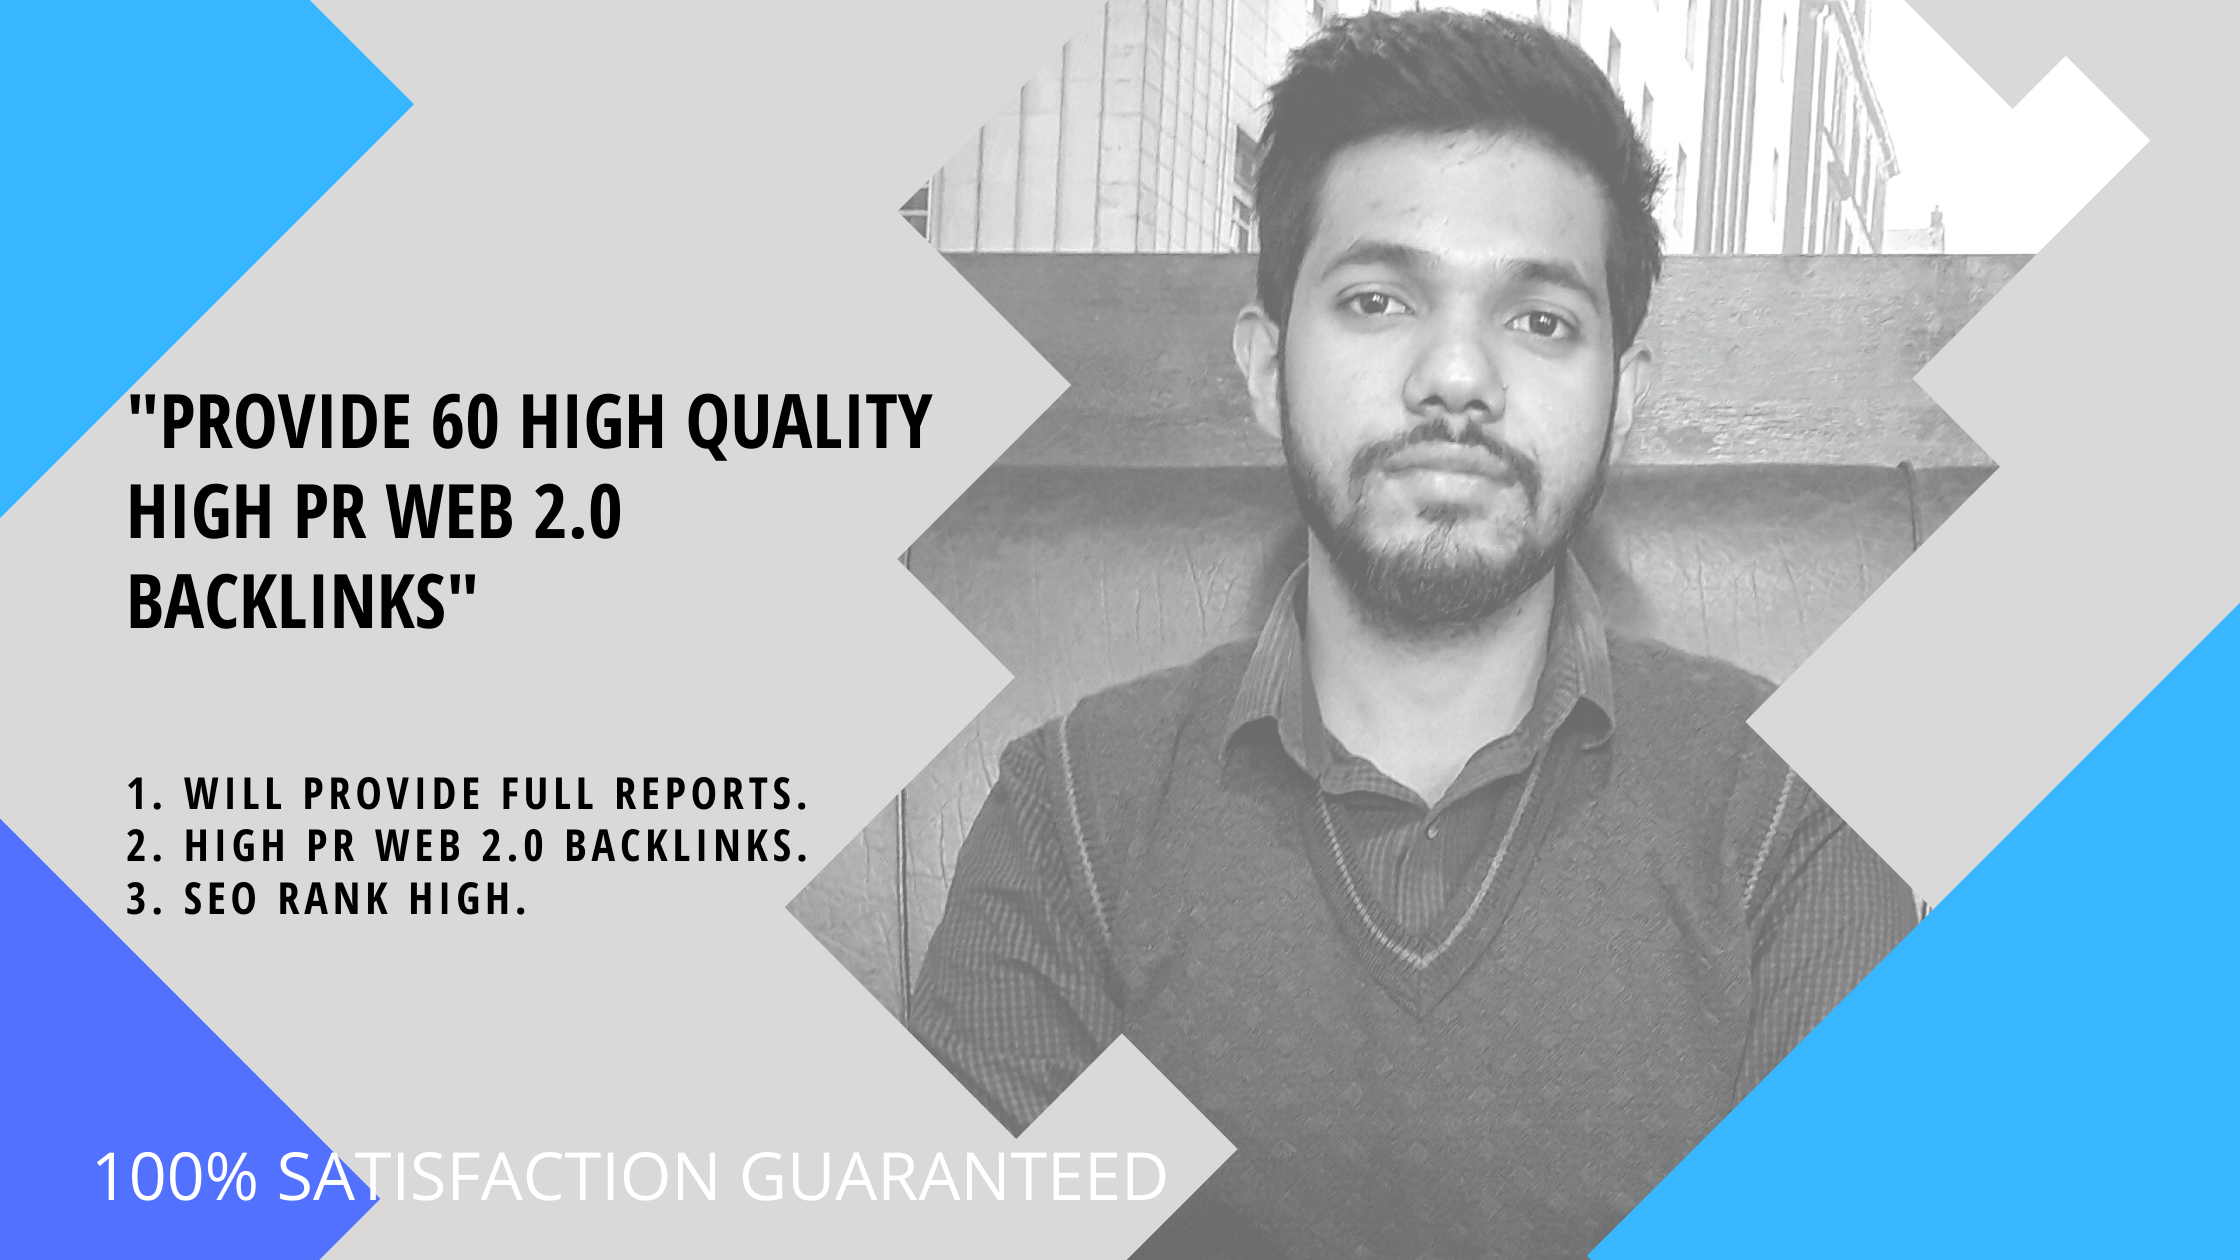 I Will Provide 60 High Qality Web 2.0 Profile Backlinks